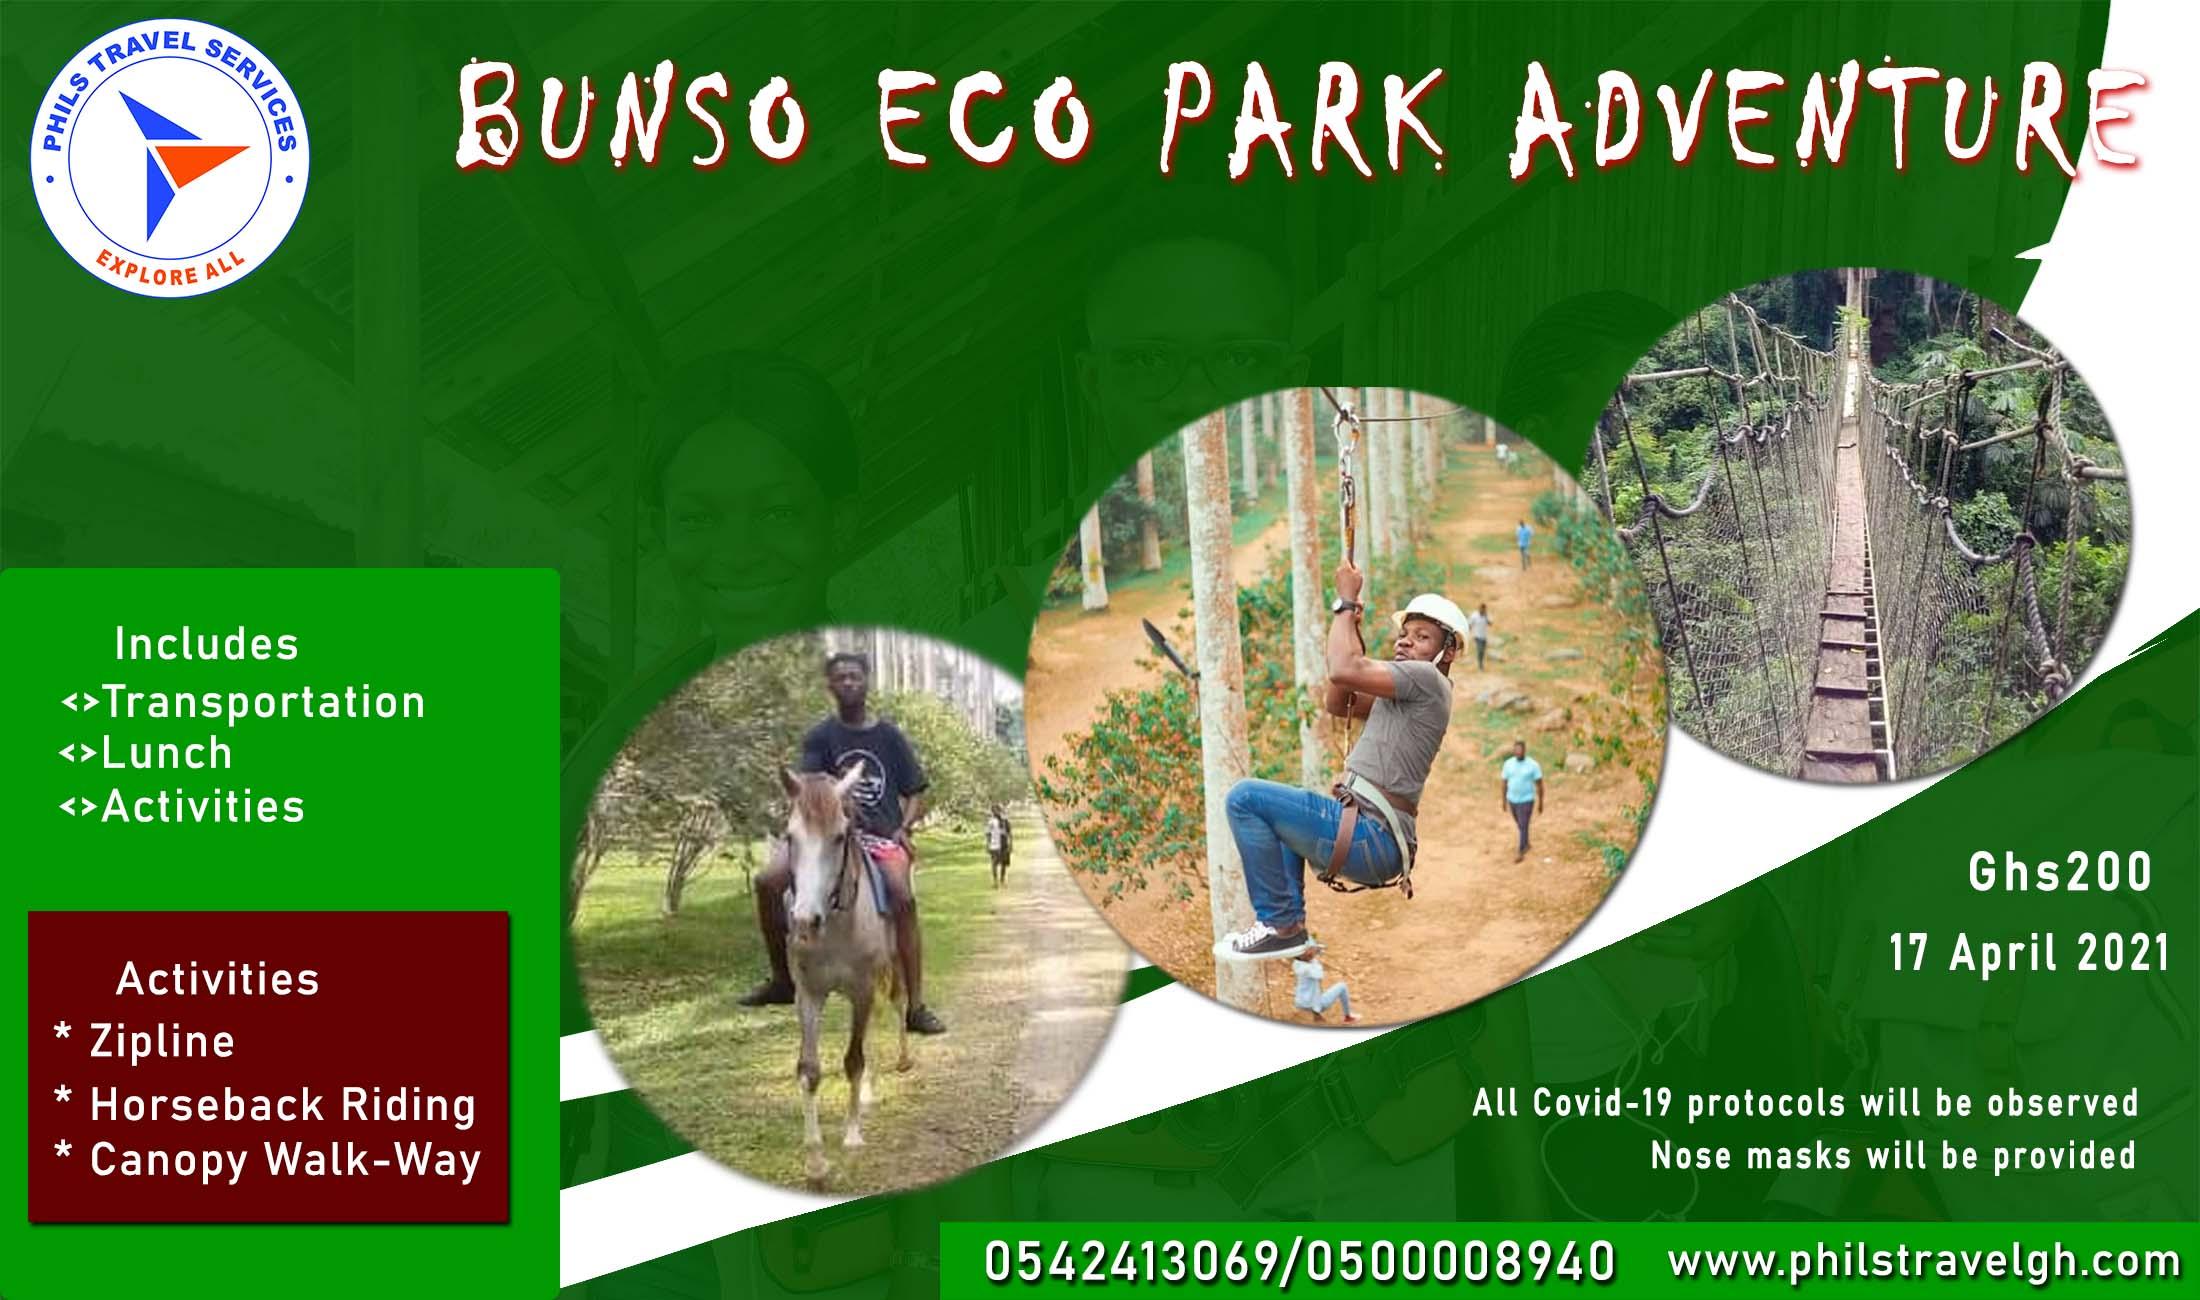 Bunso Eco Park Adventure